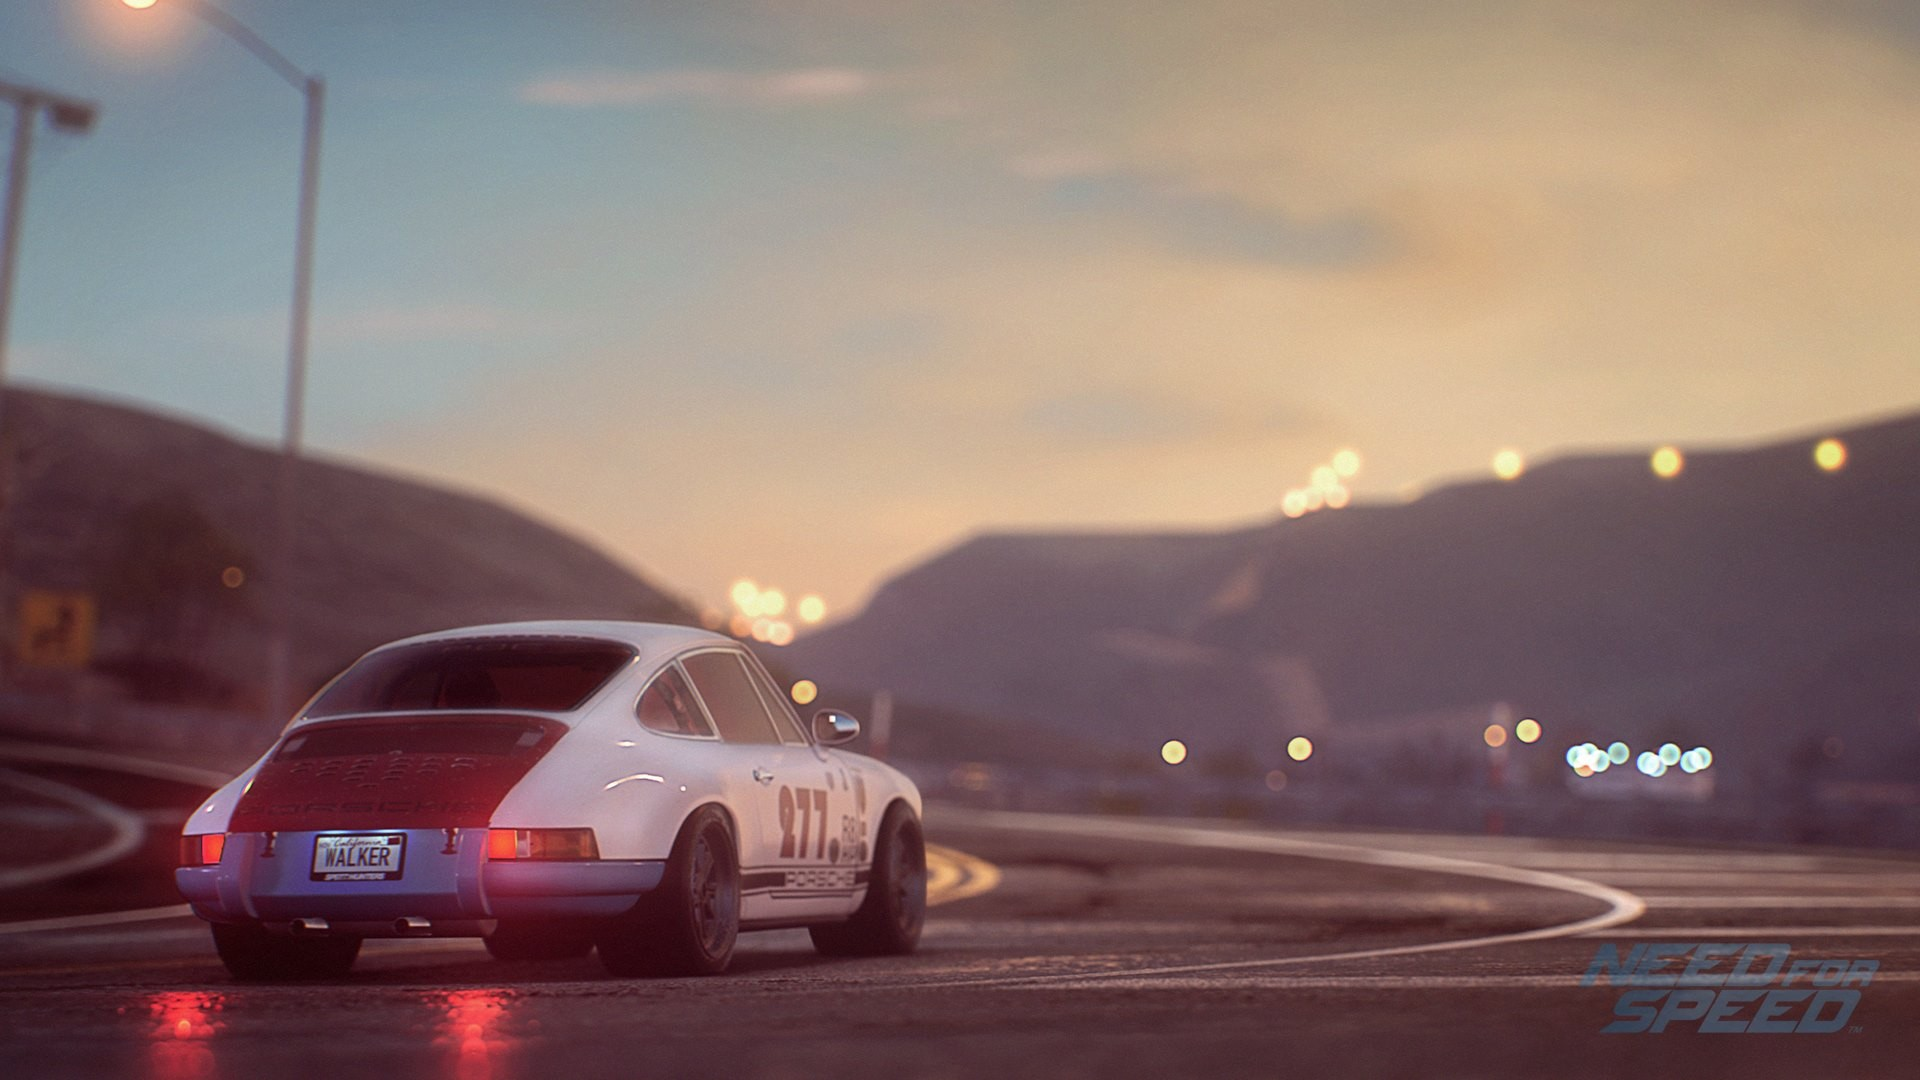 General 1920x1080 car Porsche Porsche 911 Magnus Walker Need for Speed video games